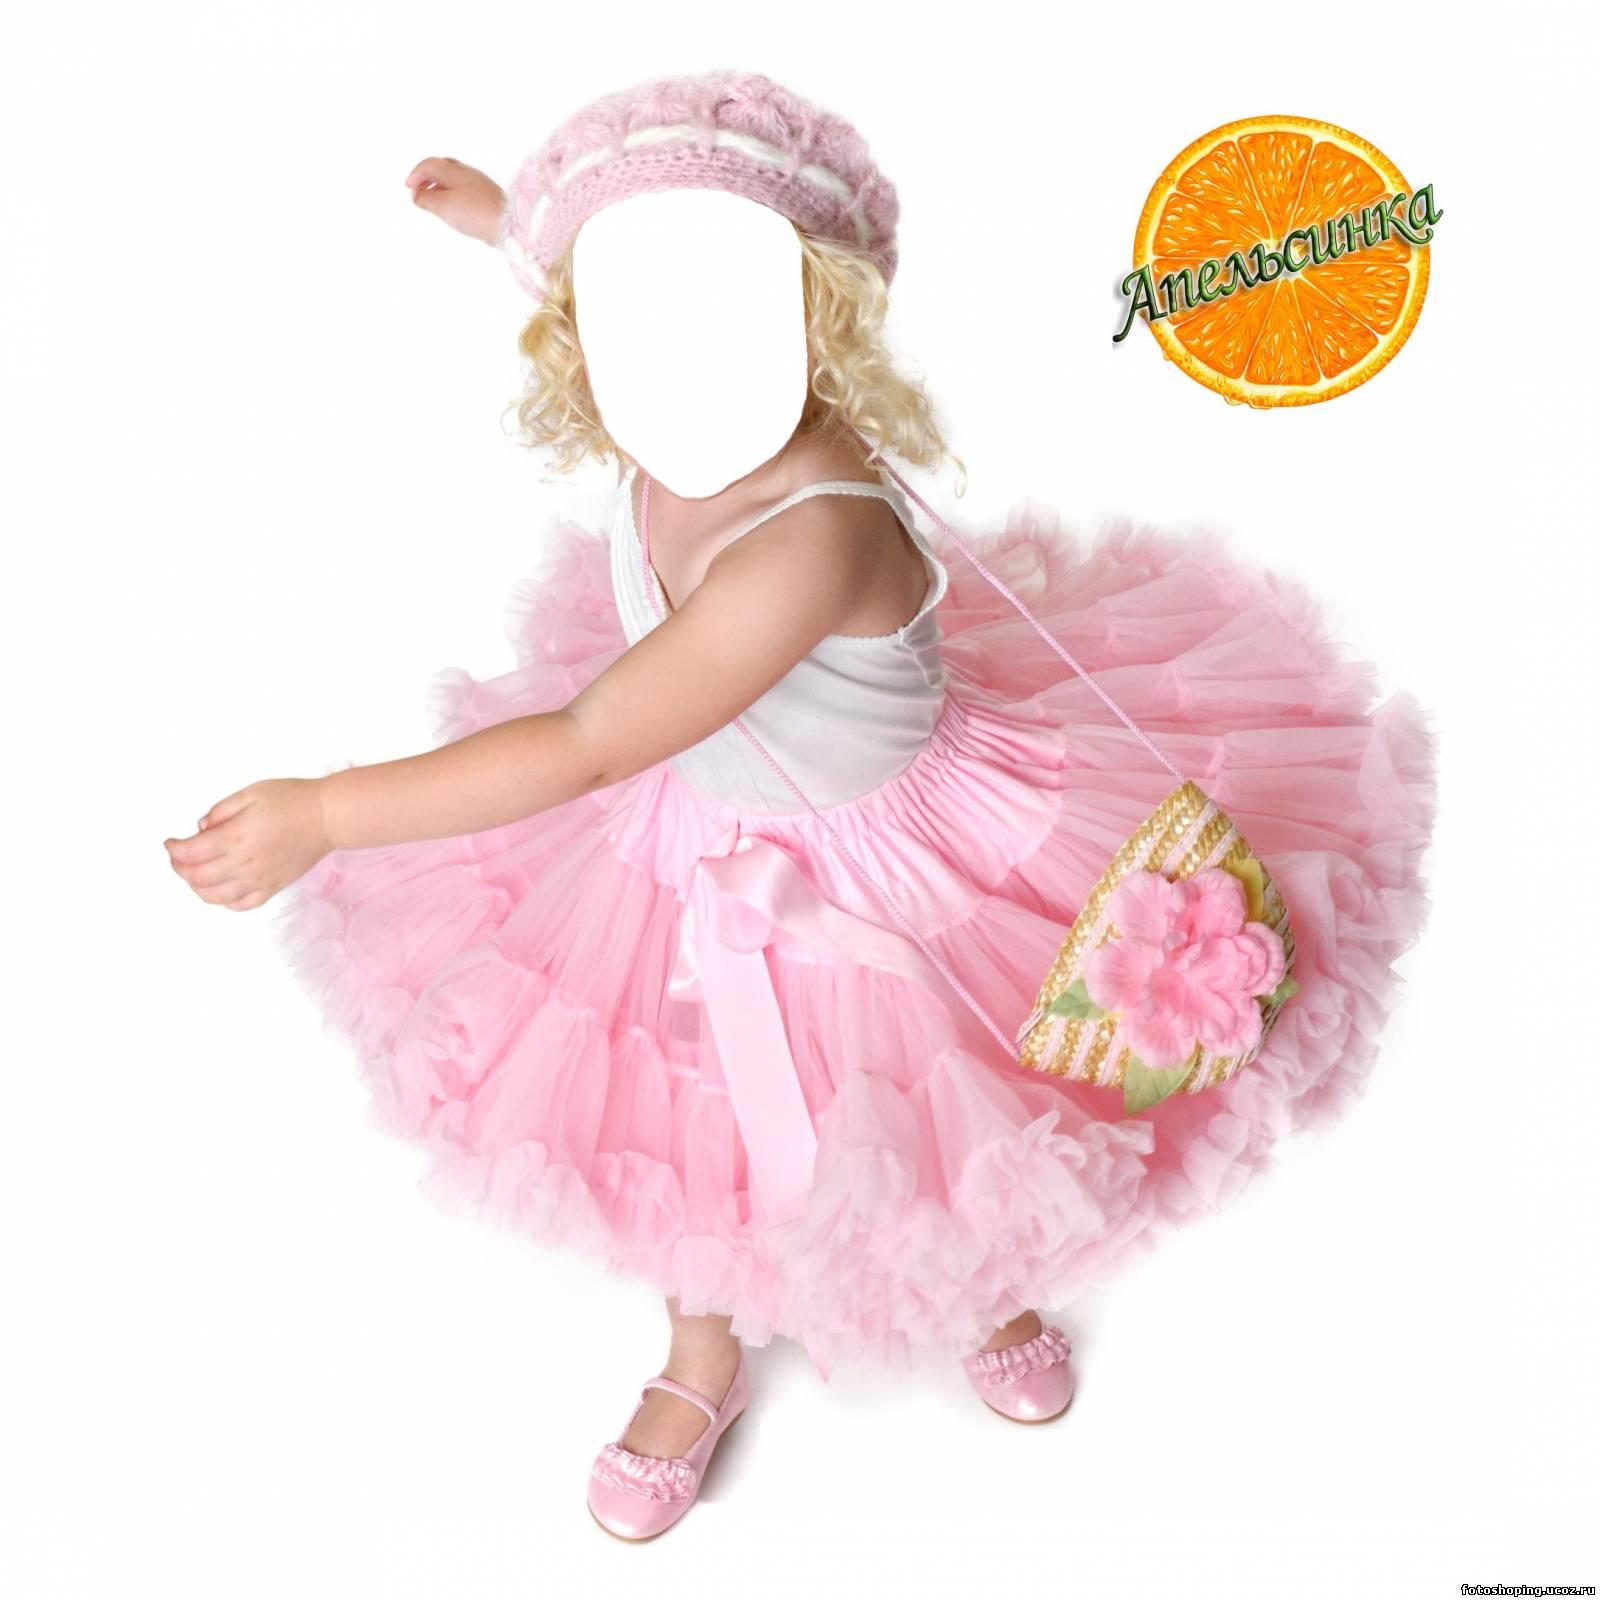 Шаблон для фотошопа девочка в розовом